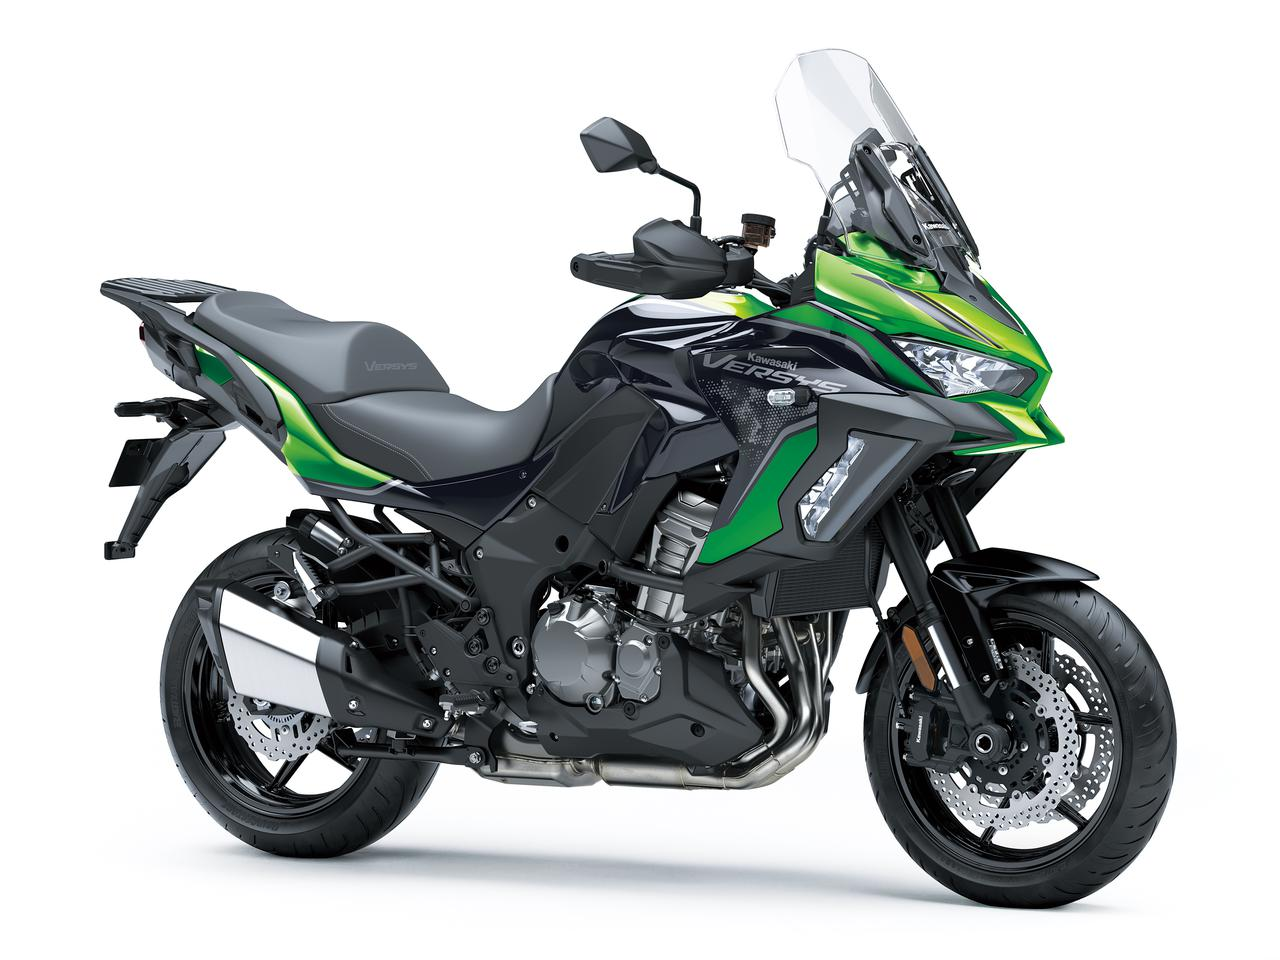 Images : 2番目の画像 - 写真をもっと見る! カワサキ「ヴェルシス1000S」(2021年モデル・欧州仕様車) - LAWRENCE - Motorcycle x Cars + α = Your Life.